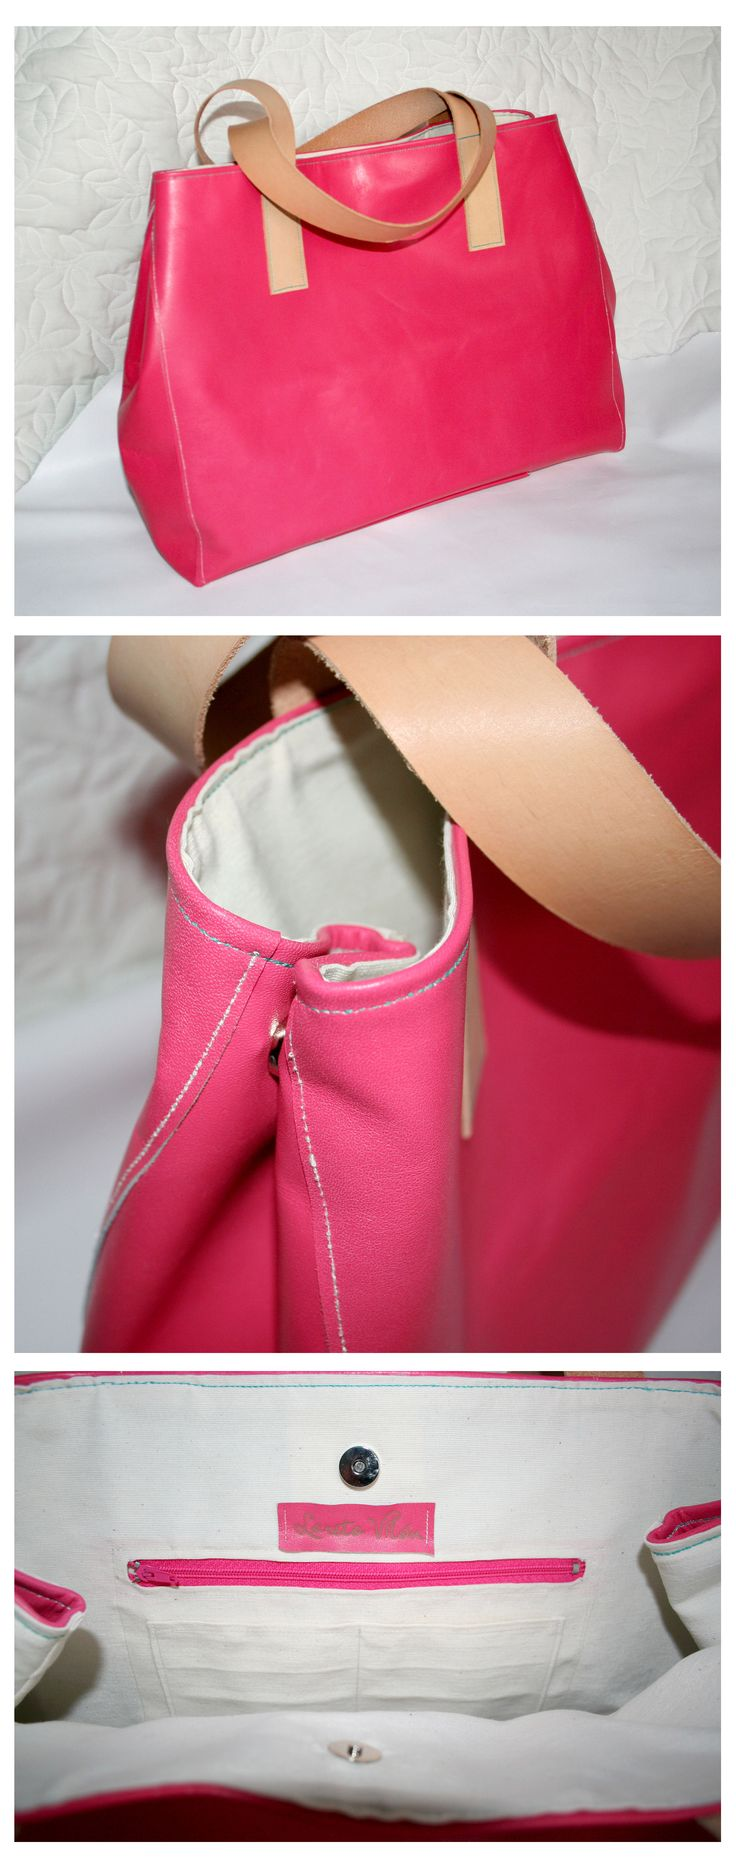 Big Bag - Pink Leather